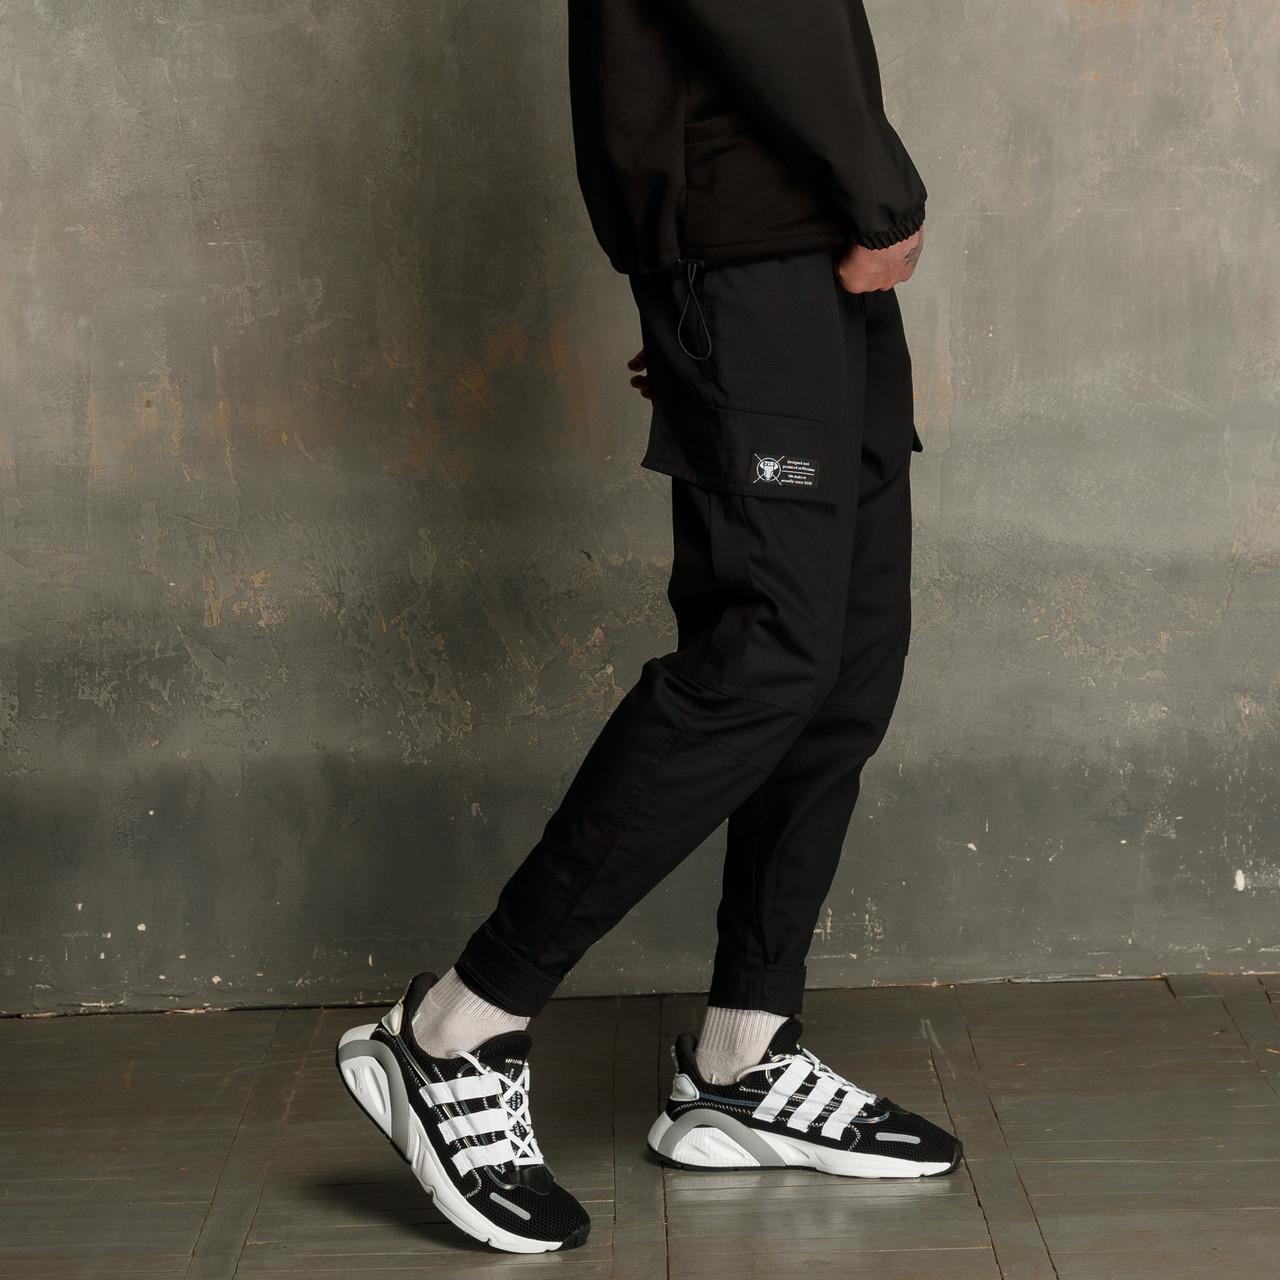 Зауженные карго штаны черные мужские от бренда ТУР Карнаж размер S, M, L, XL TURWEAR